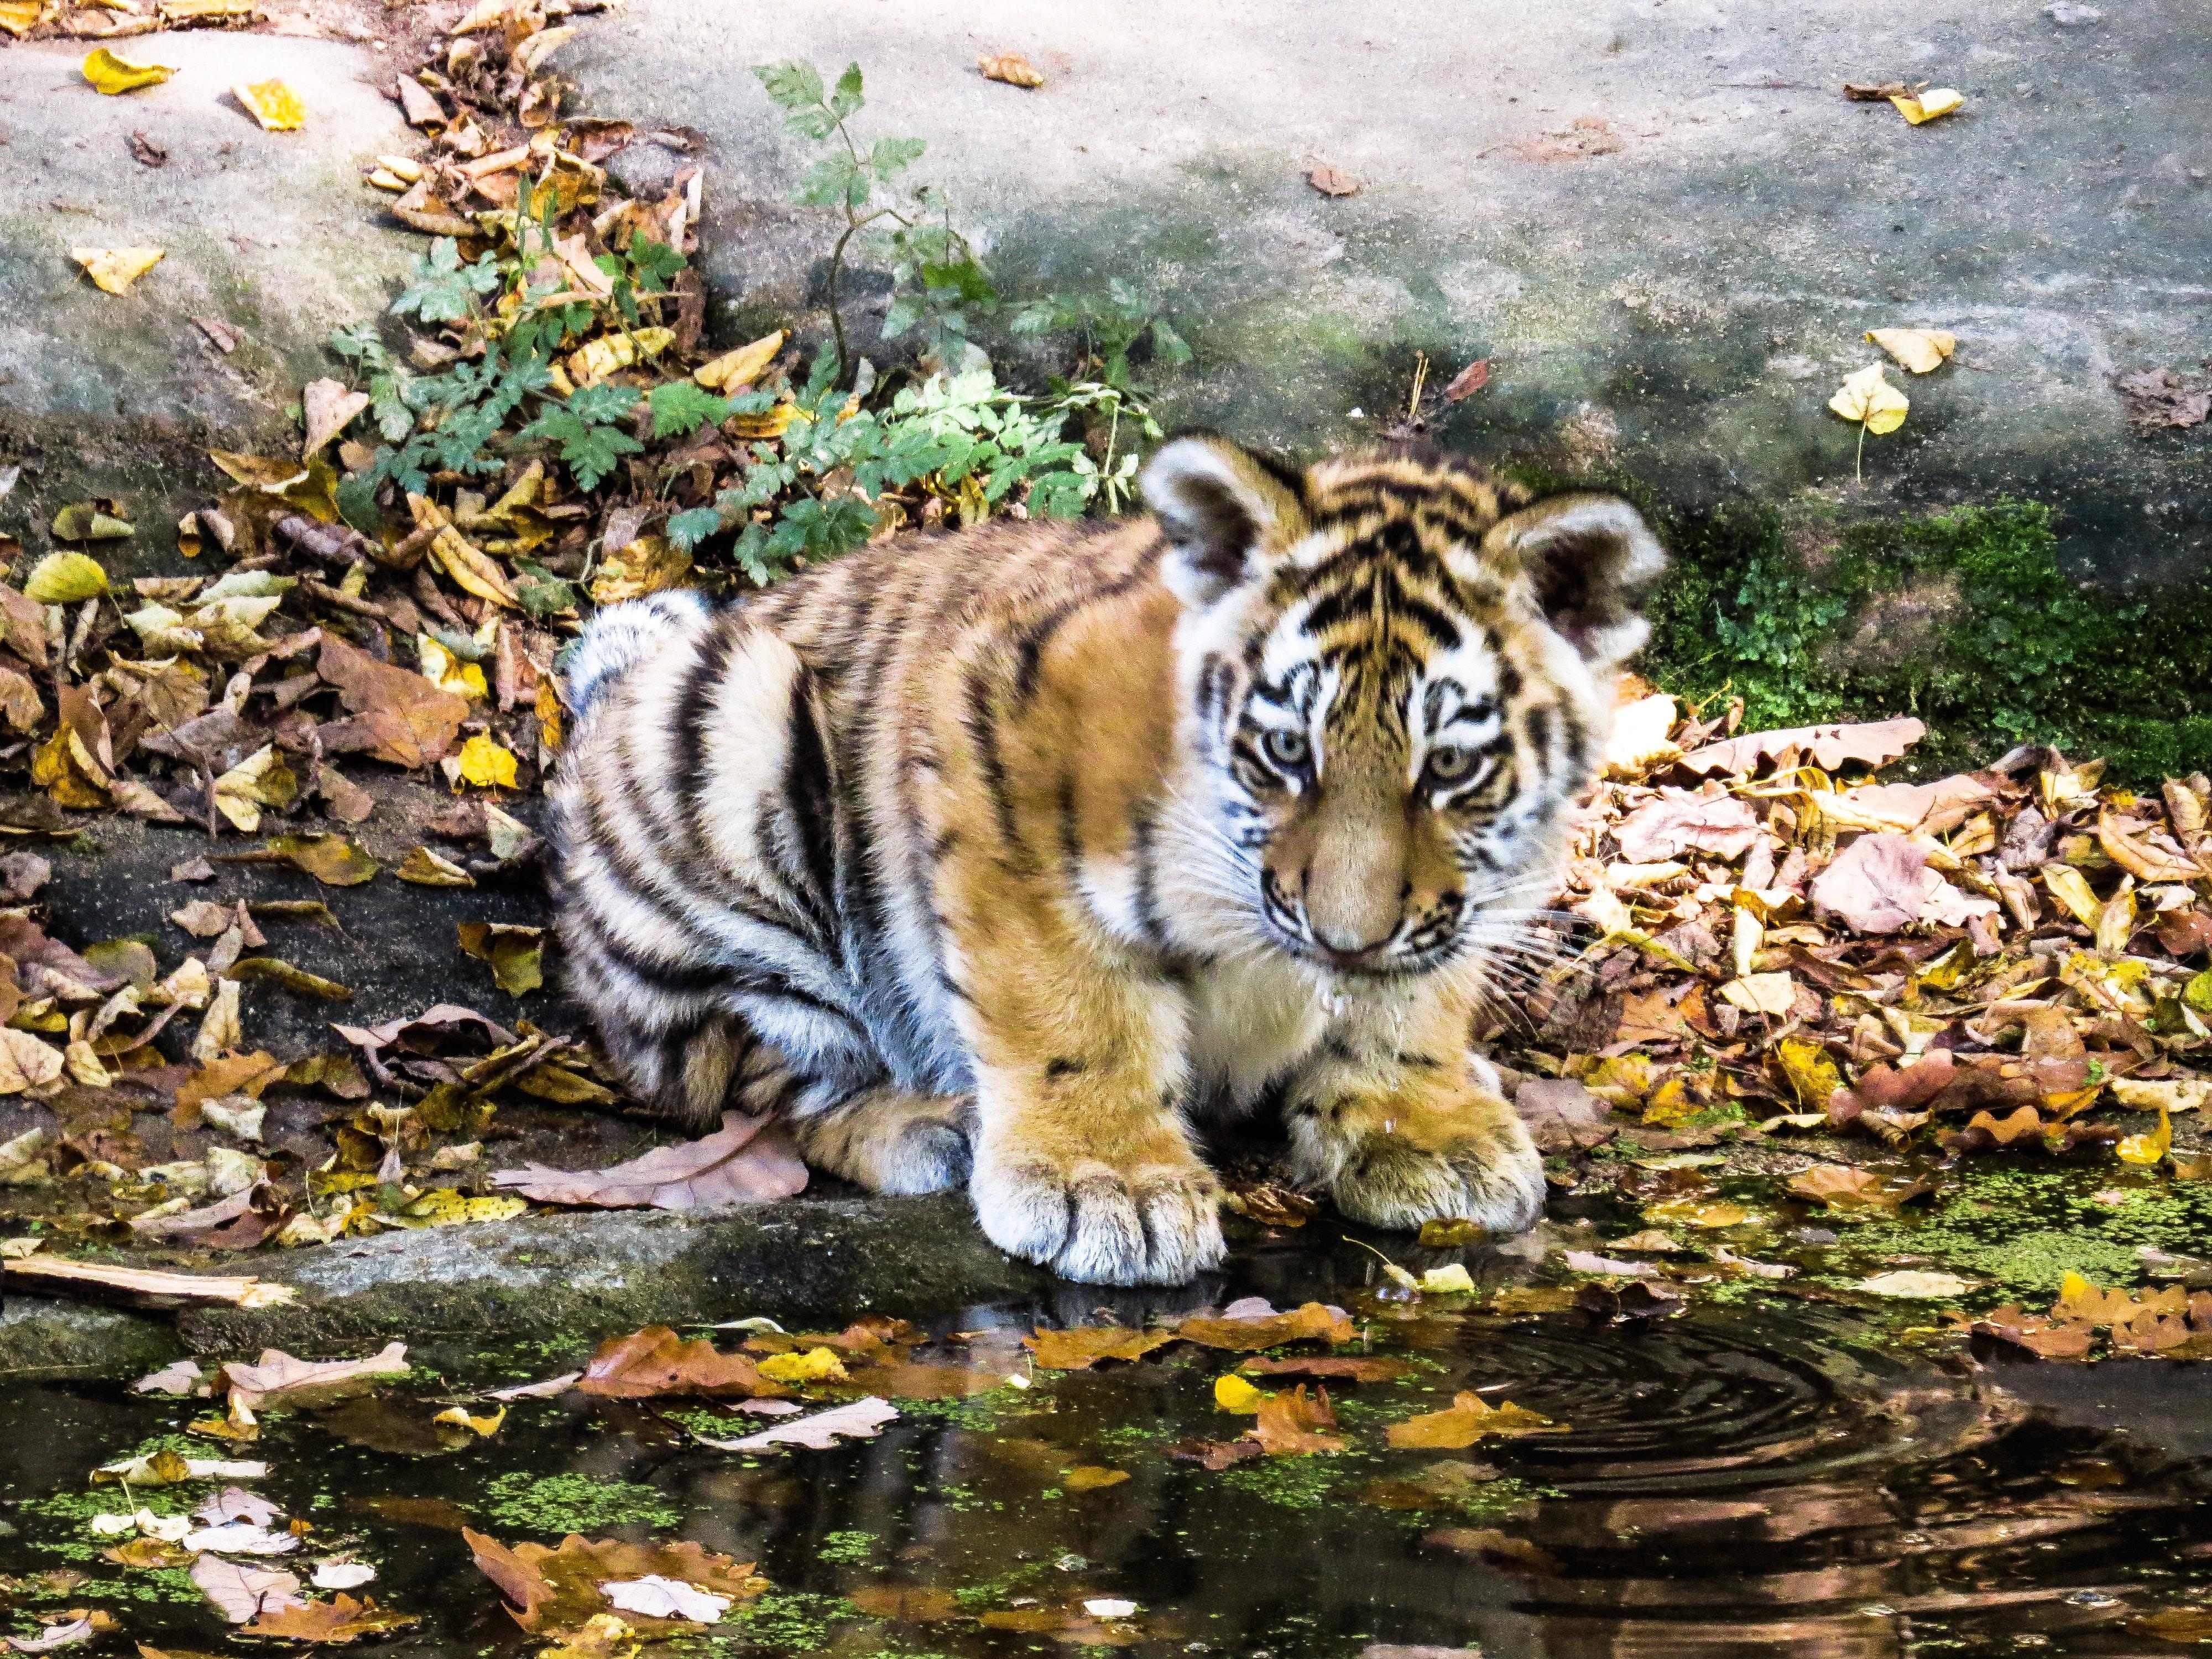 48 Gambar Lucu Binatang Air Terbaru